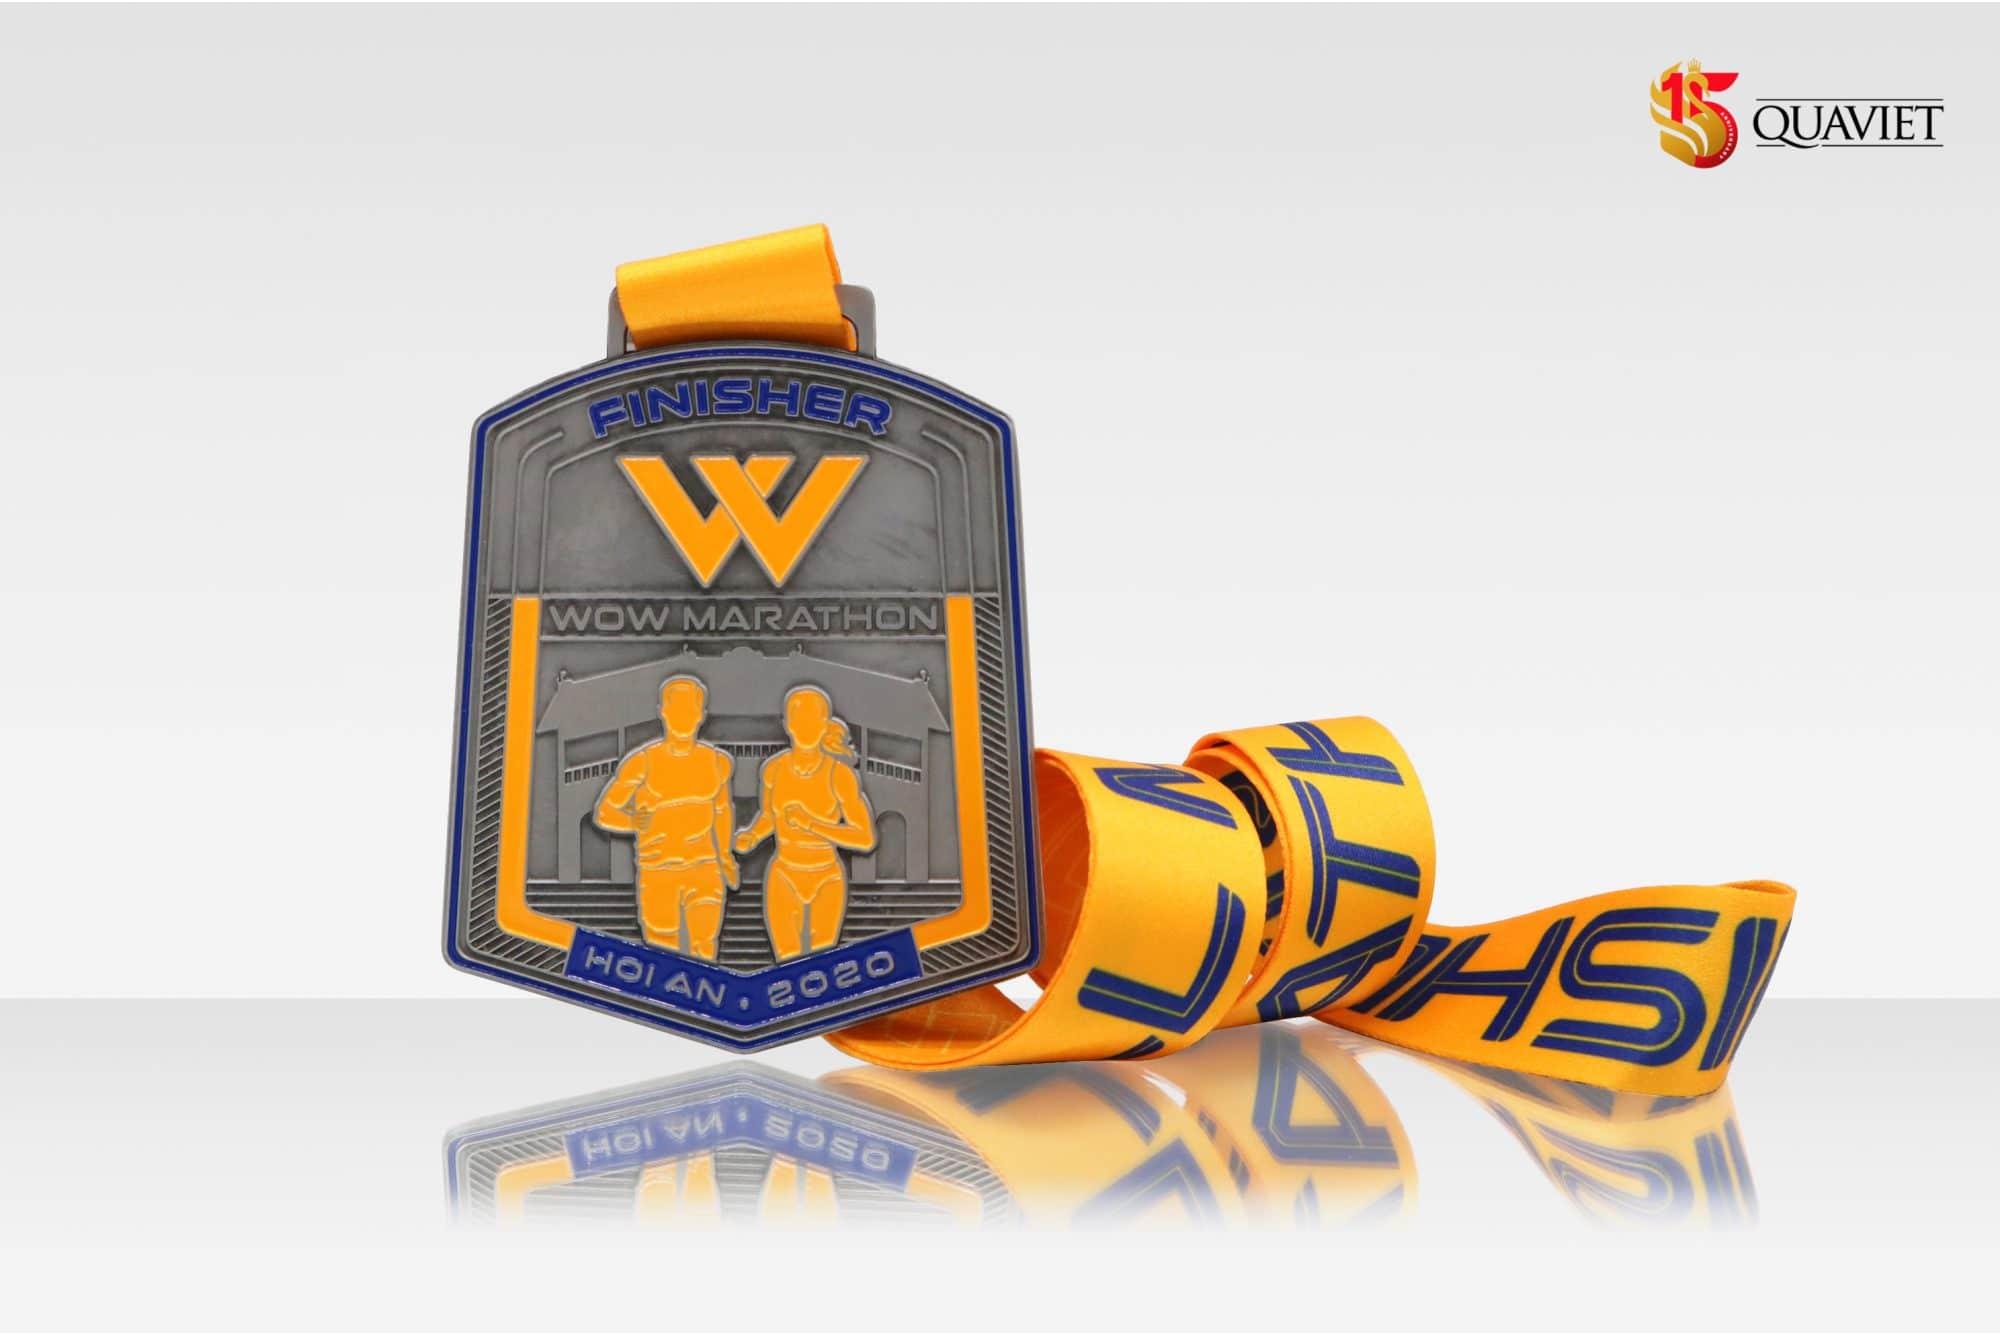 huy-chuong-milano-medal-vinh-danh-tinh-than-the-thao-tai-virtual-wow-marathon-hoi-an-2020